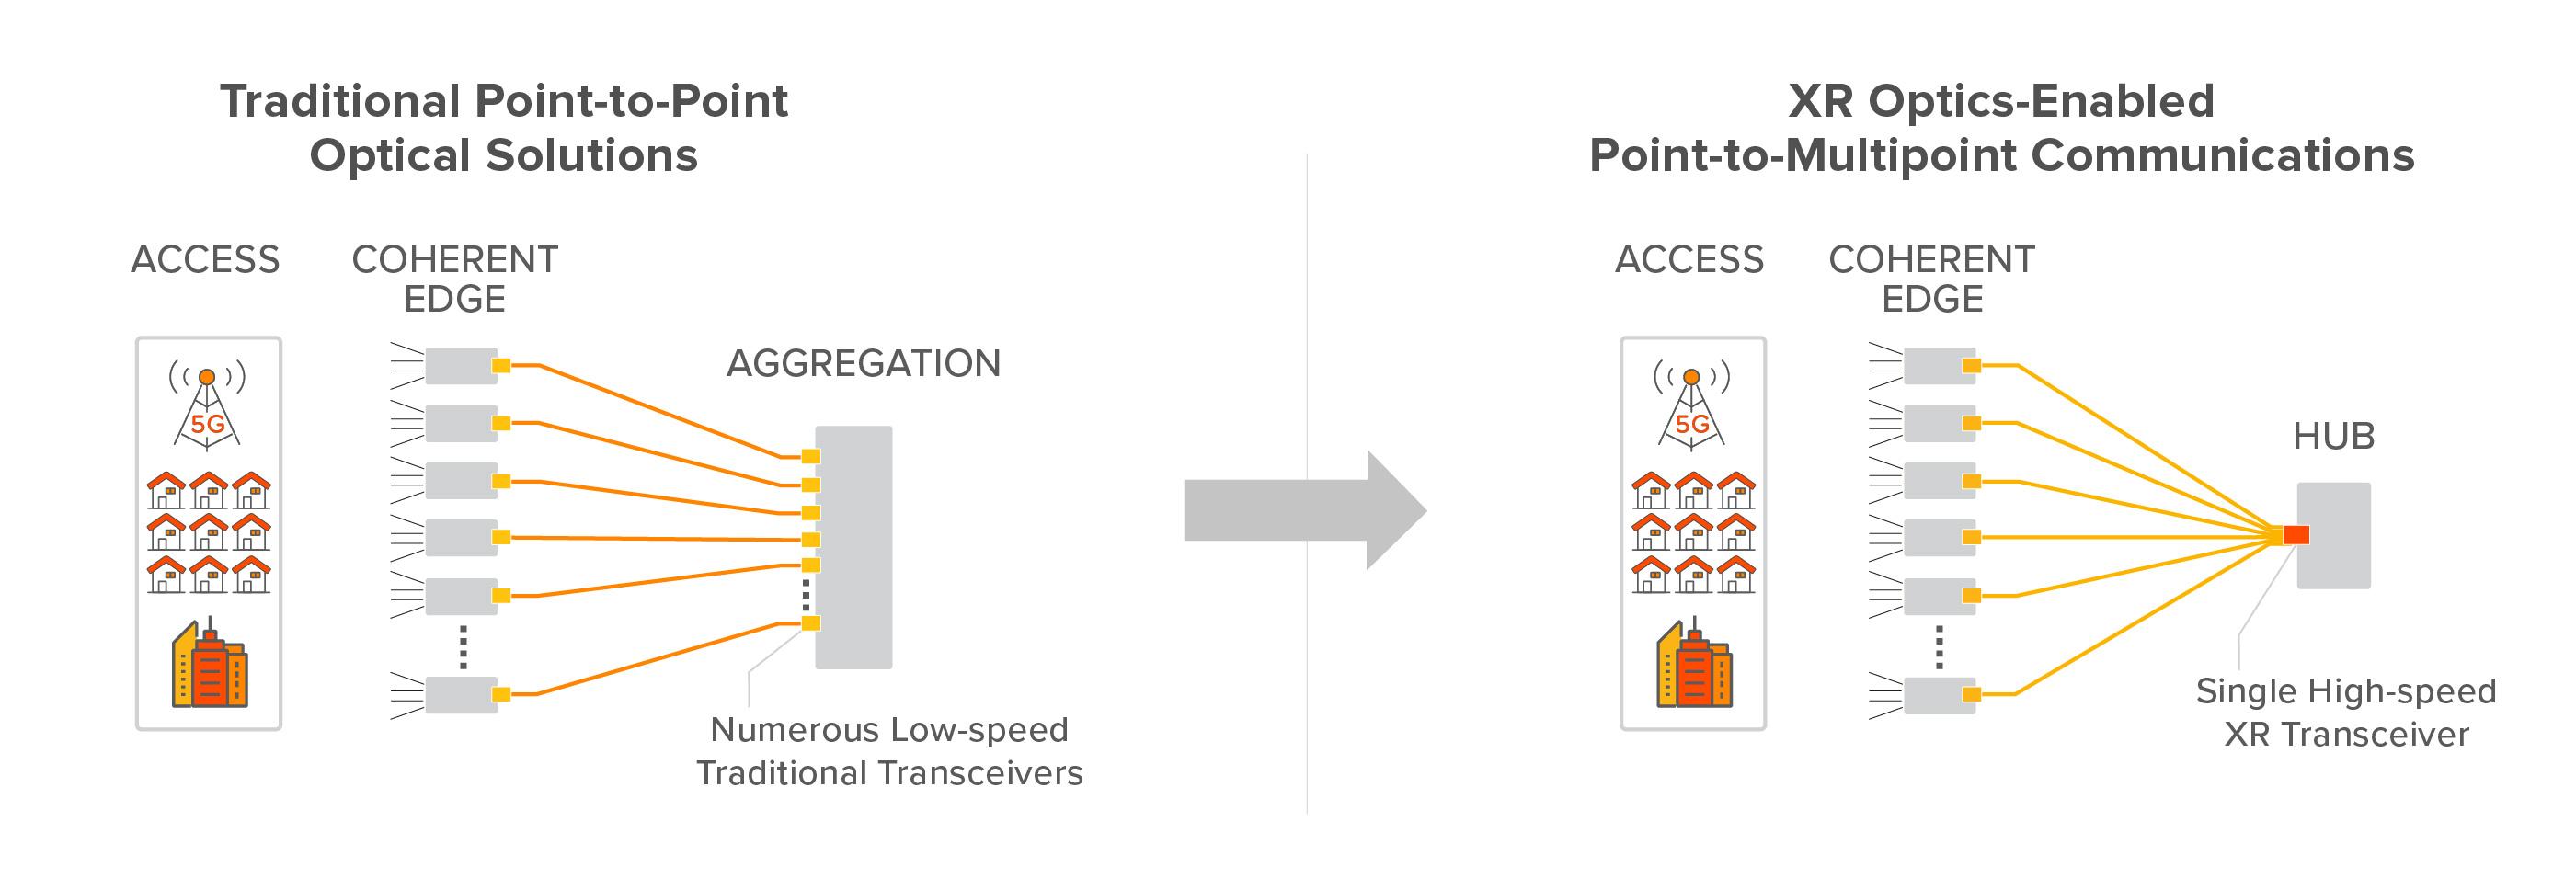 point ot point optical network